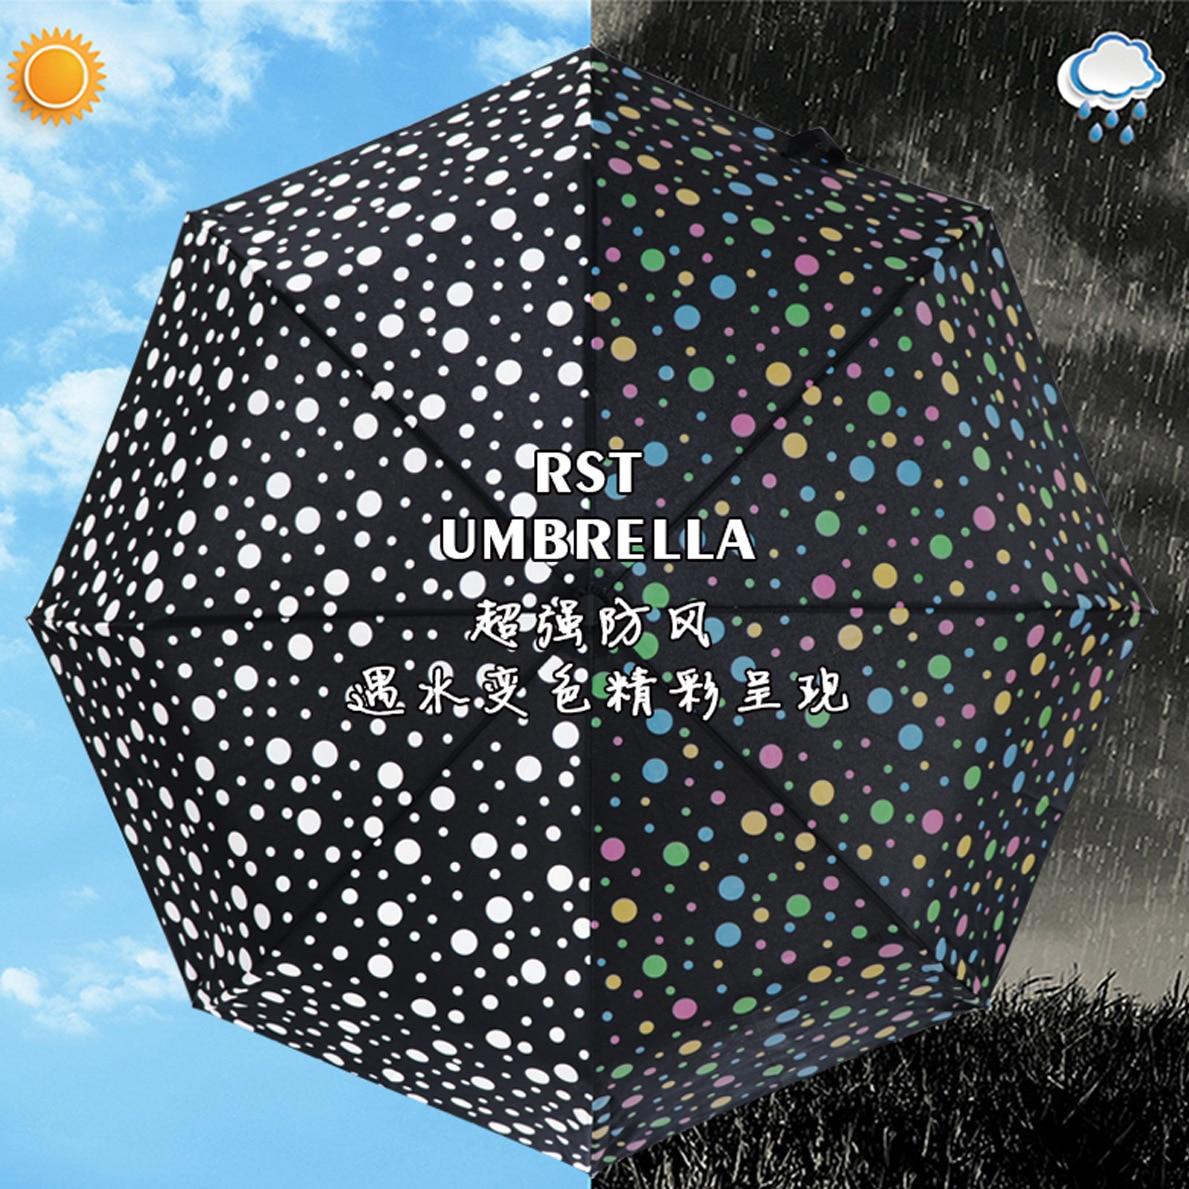 Real Star Umbrella Water Discoloration Polka Dot Automatic Umbrella Rain Or Shine Dual Purpose Tri-fold Umbrella